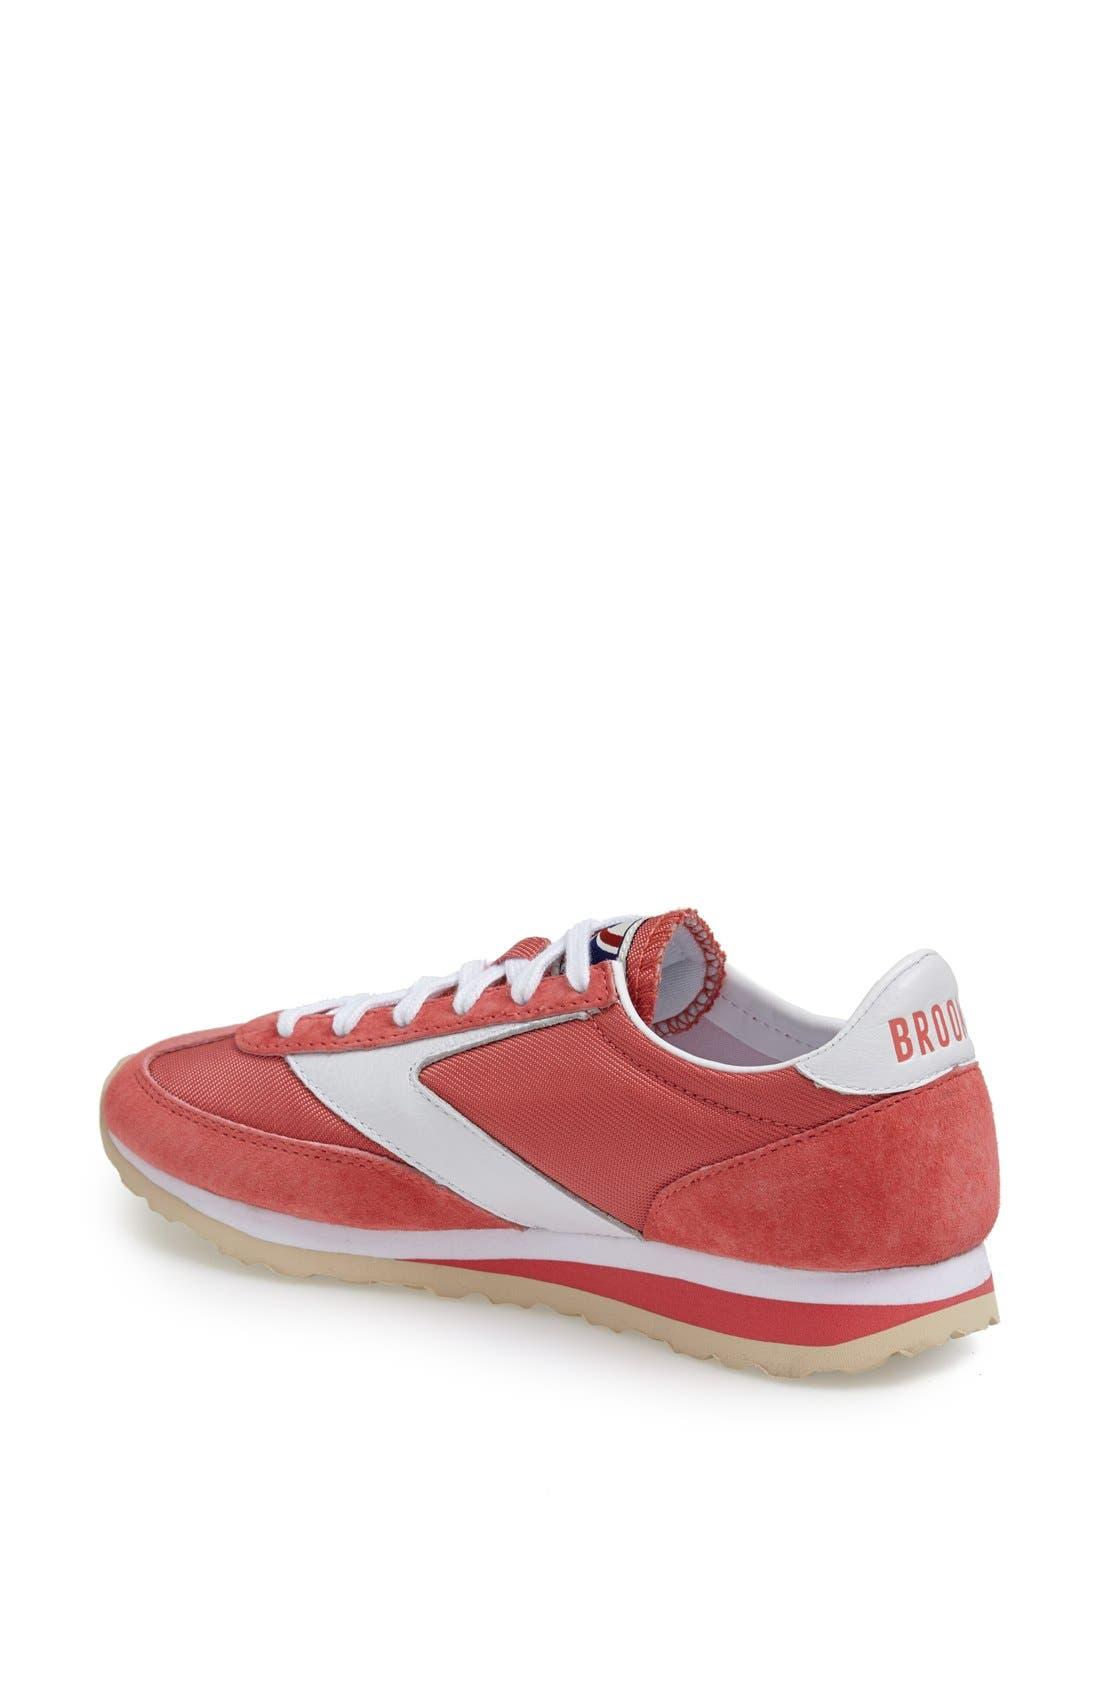 'Vanguard' Sneaker,                             Alternate thumbnail 181, color,